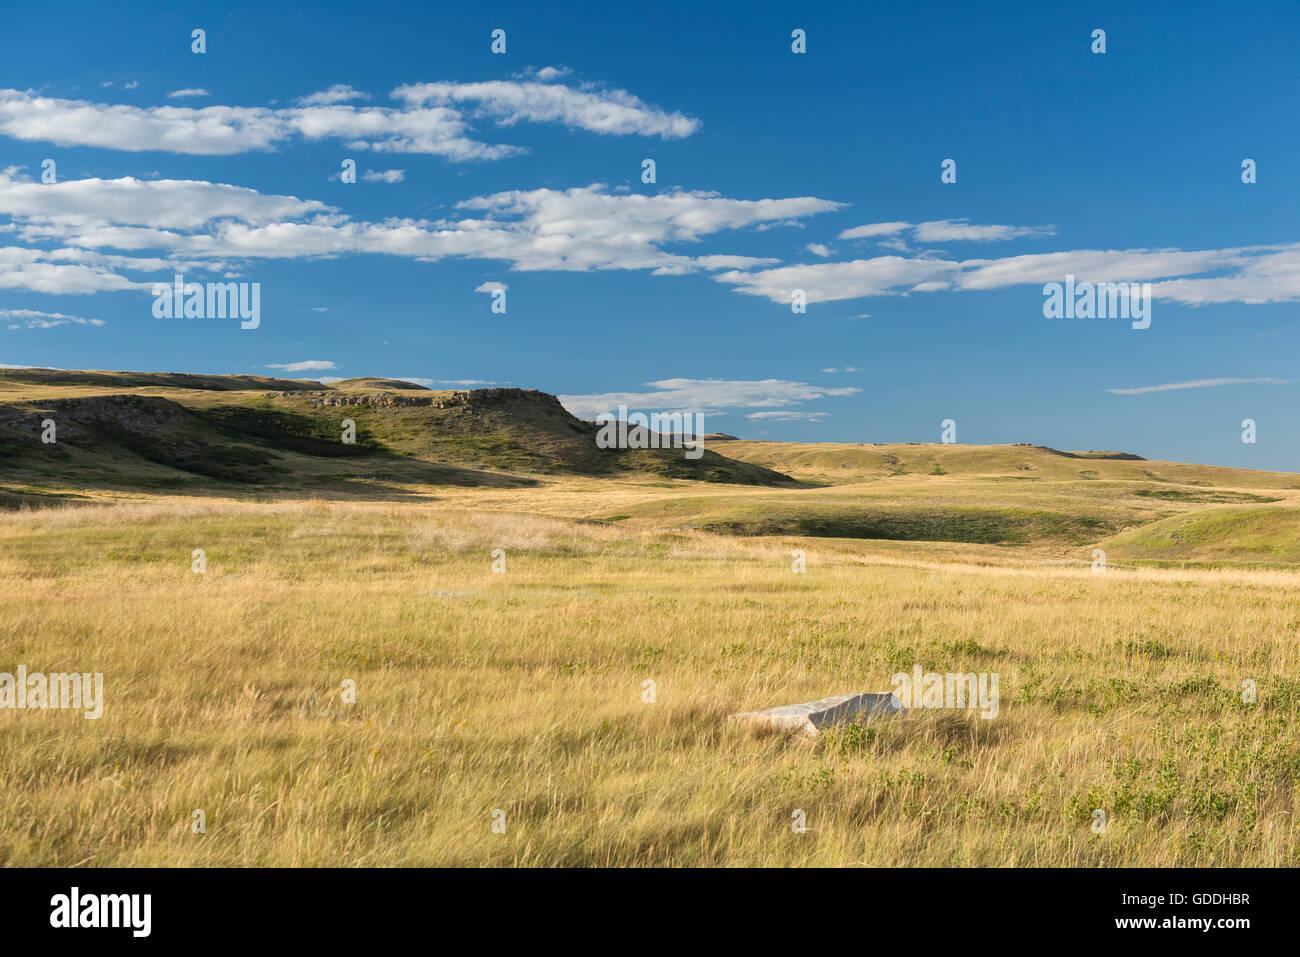 Grassland - Stock Image